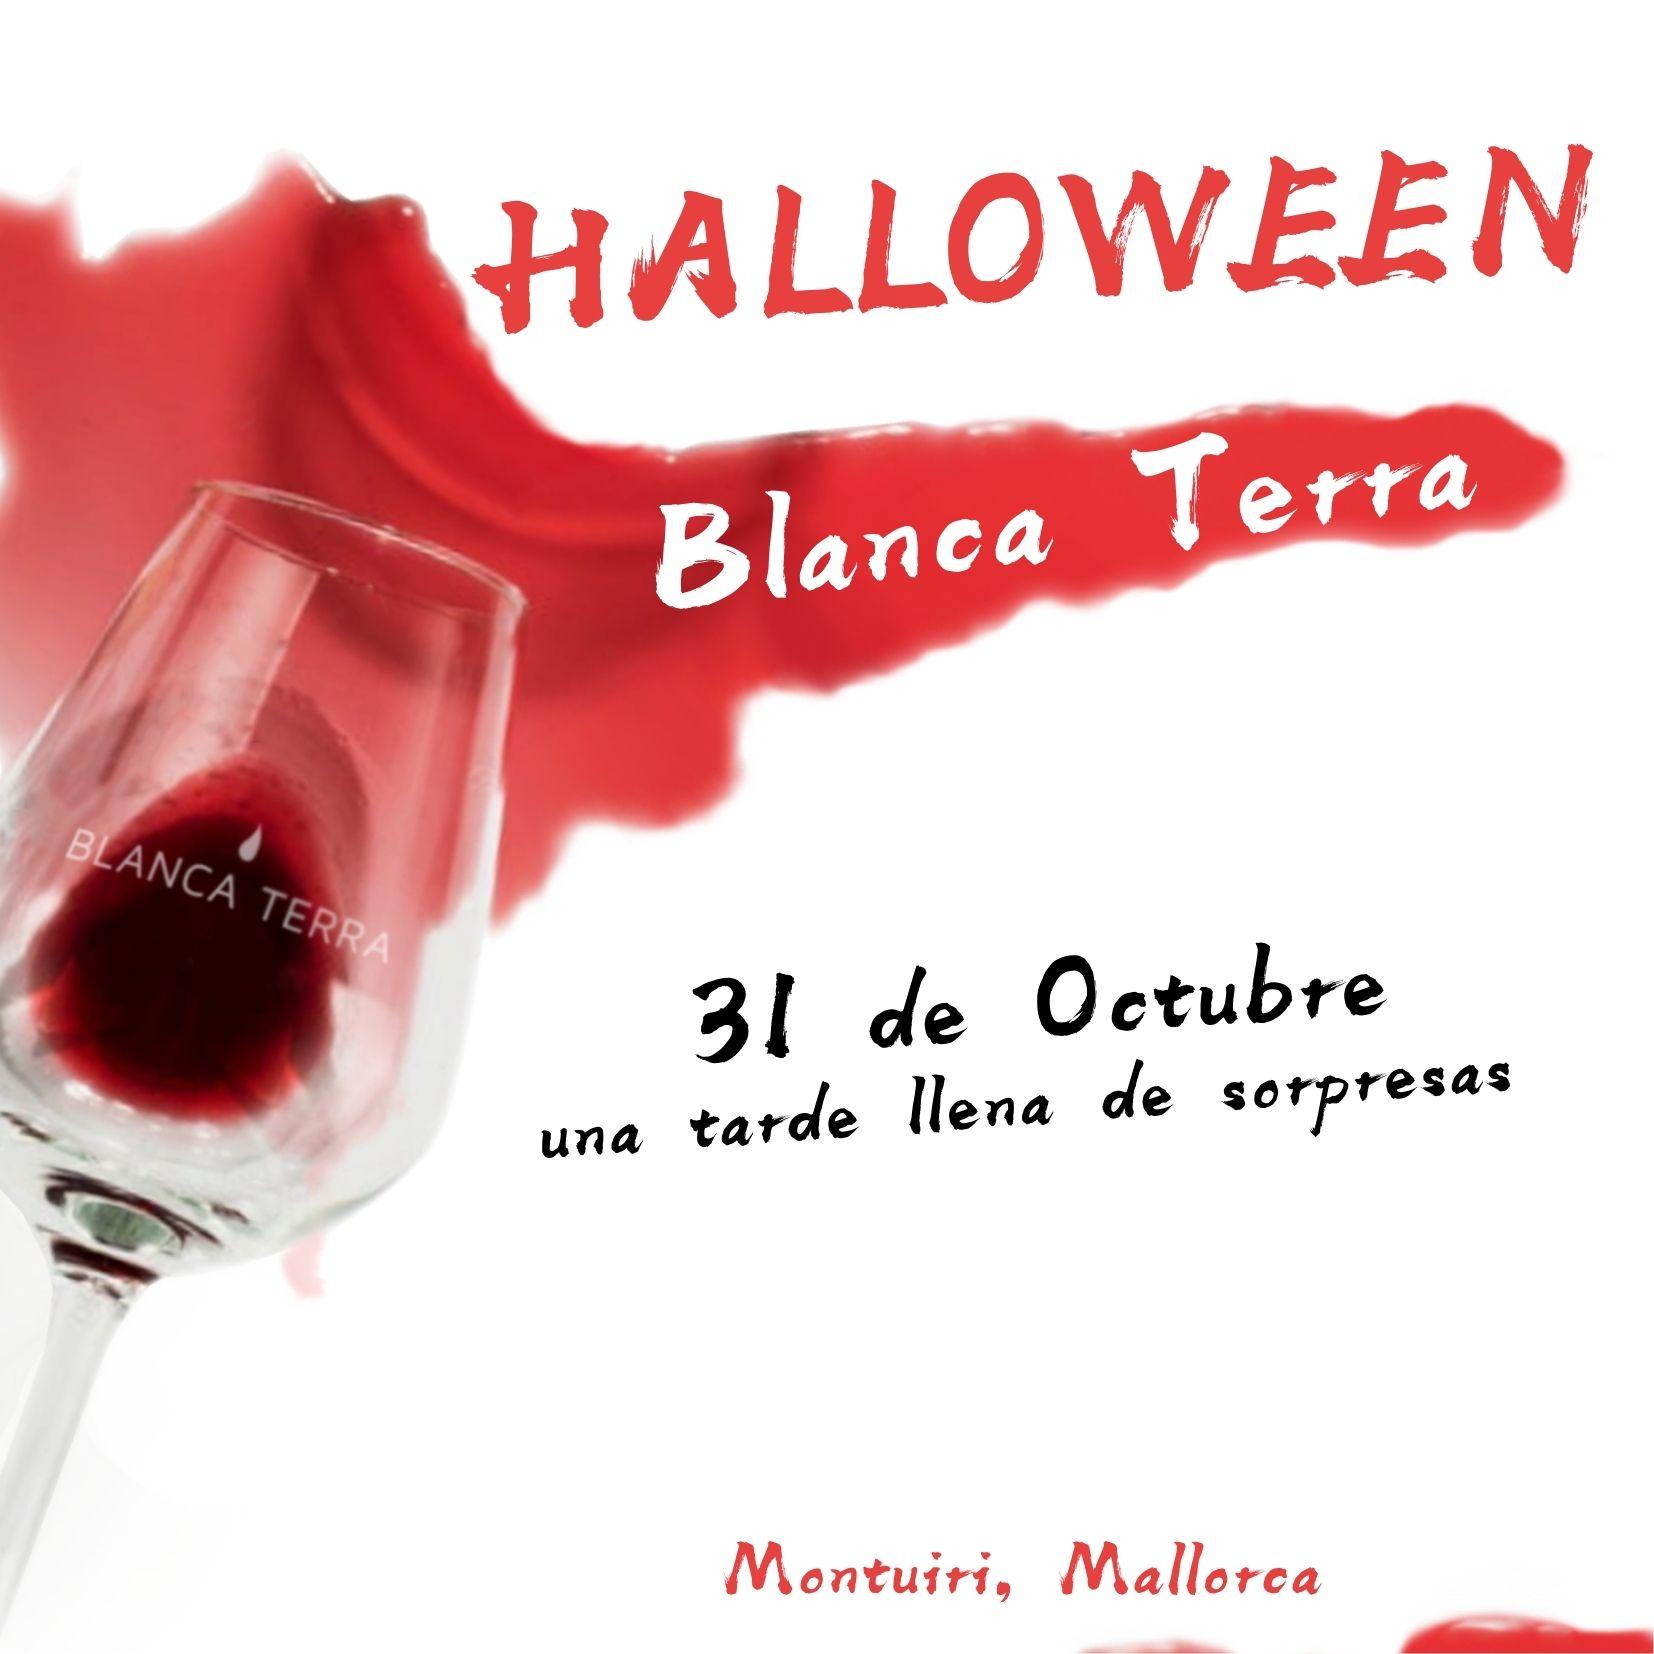 Blanca Terra celebra la festa de 'Halloween' | cartell